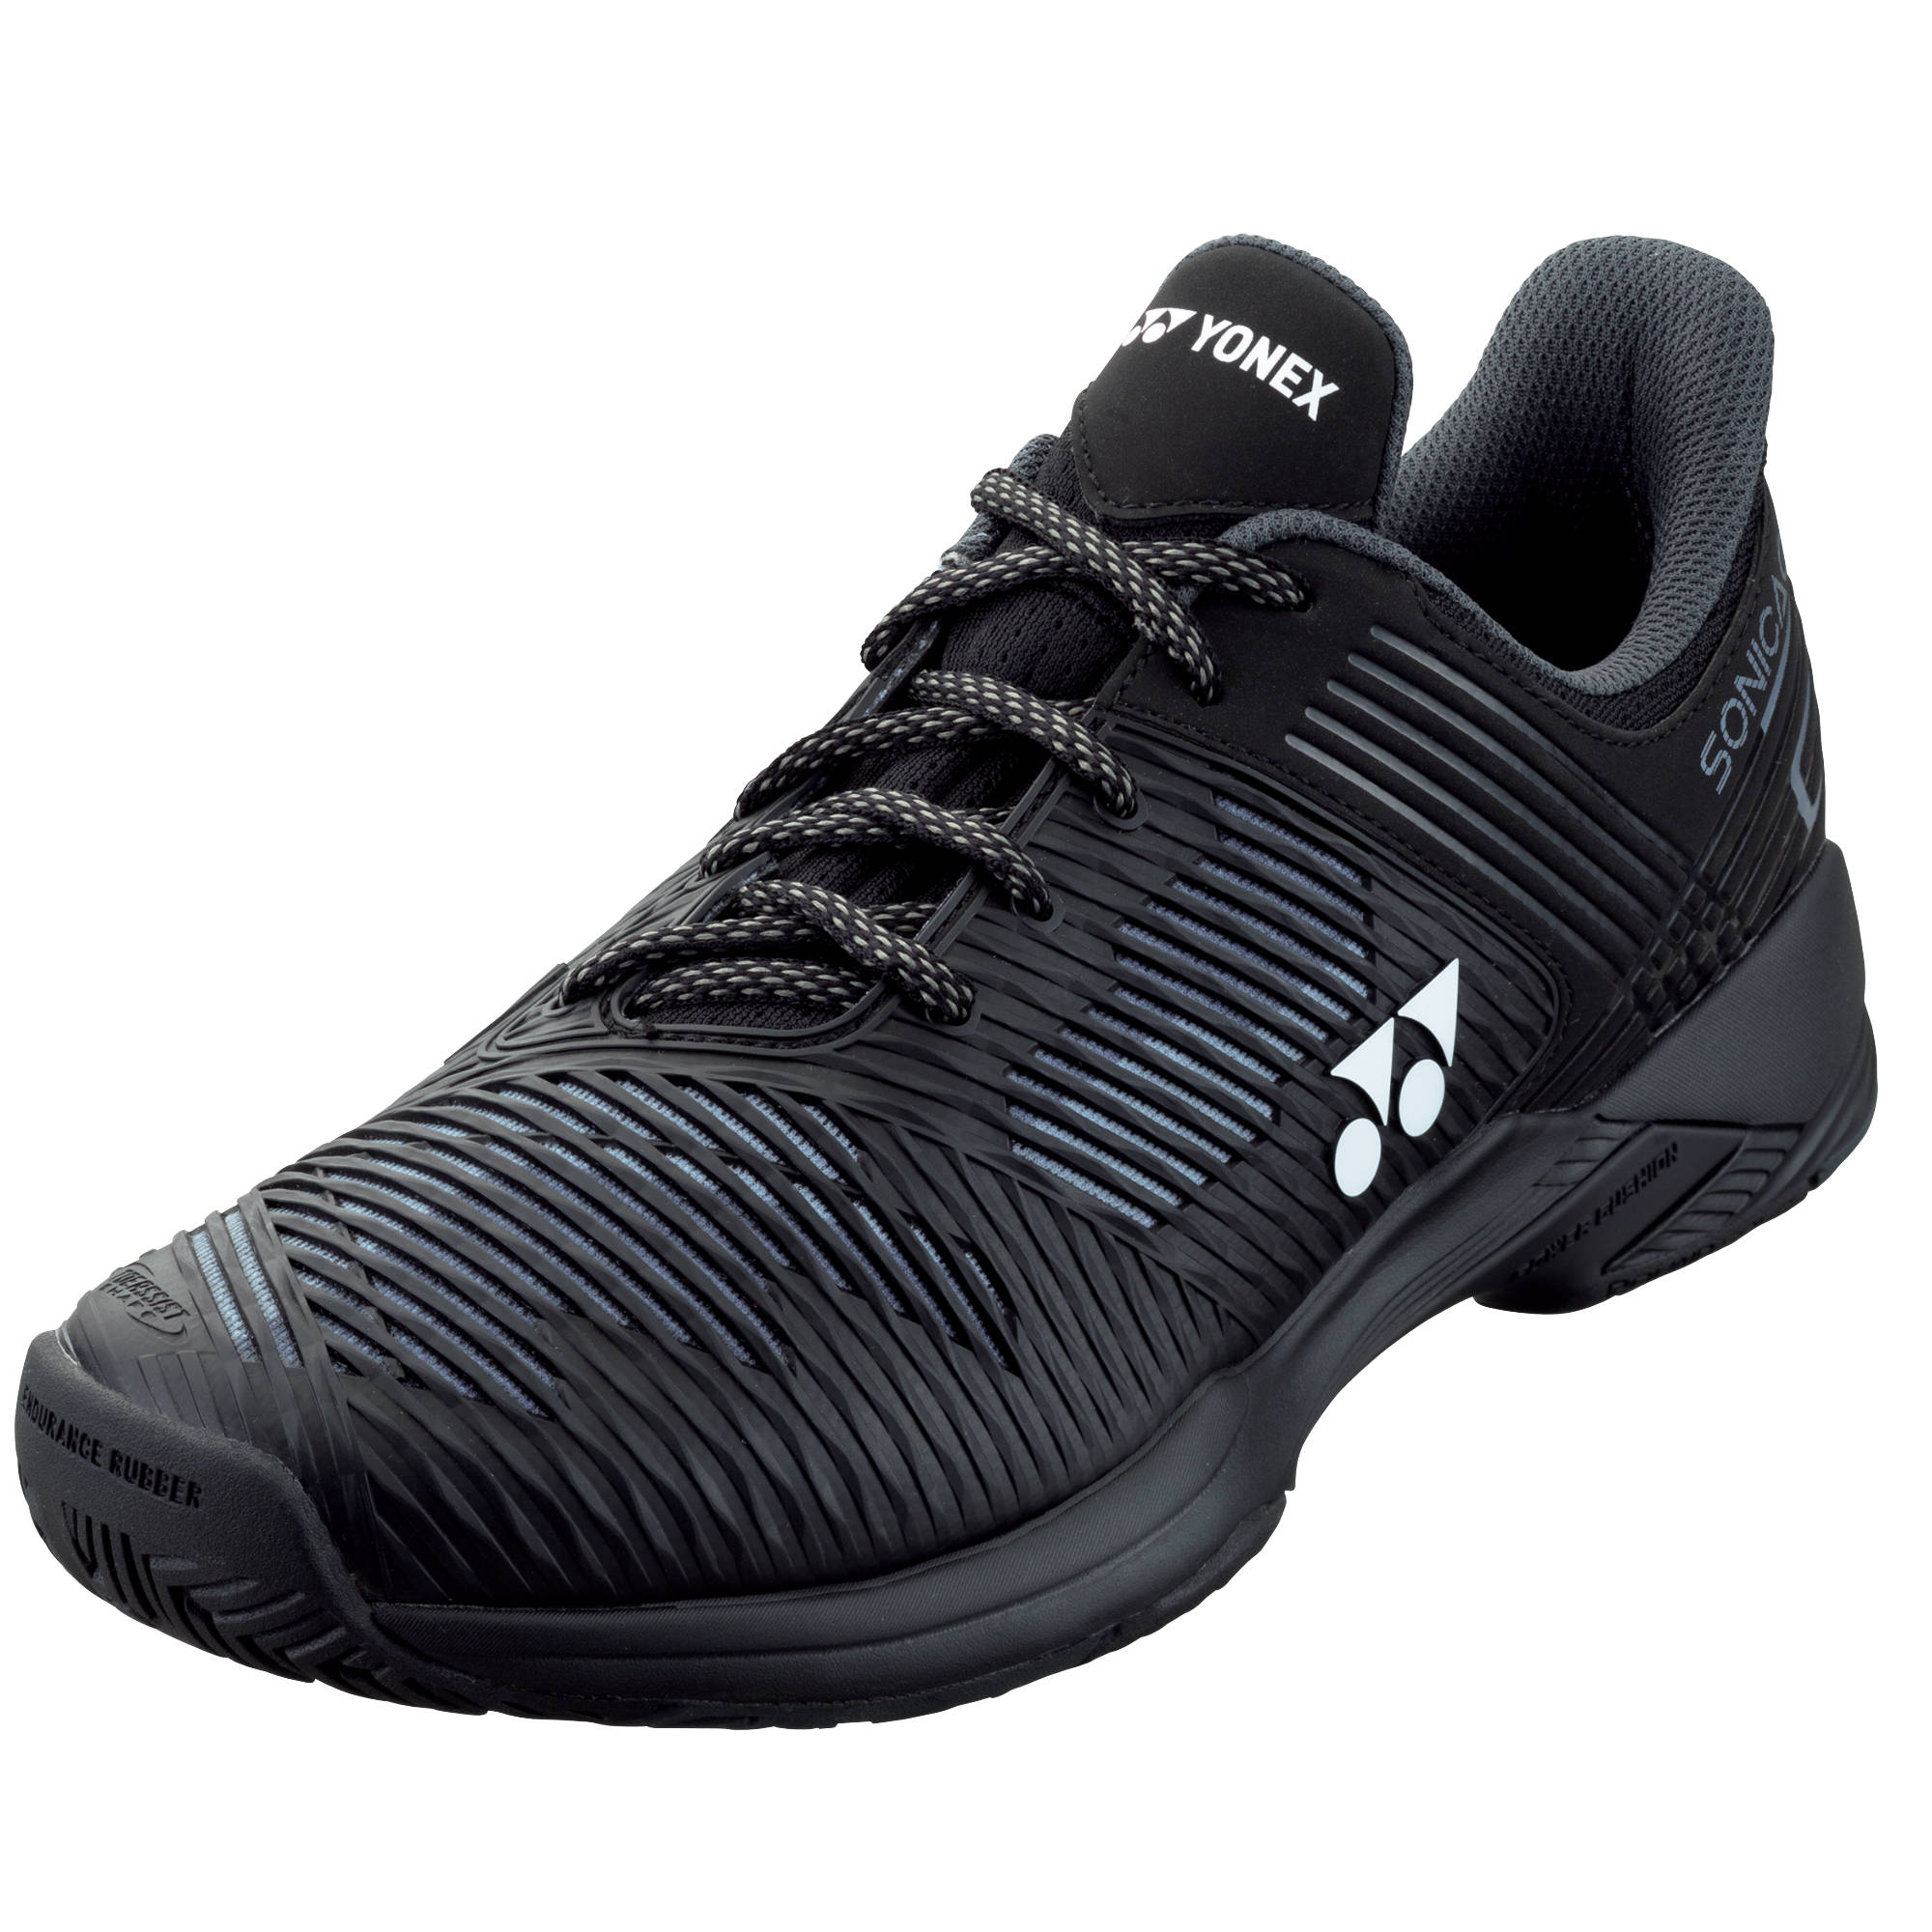 Yonex Power Cushion Sonicage 2 Mens Tennis Shoes - 11.5 UK